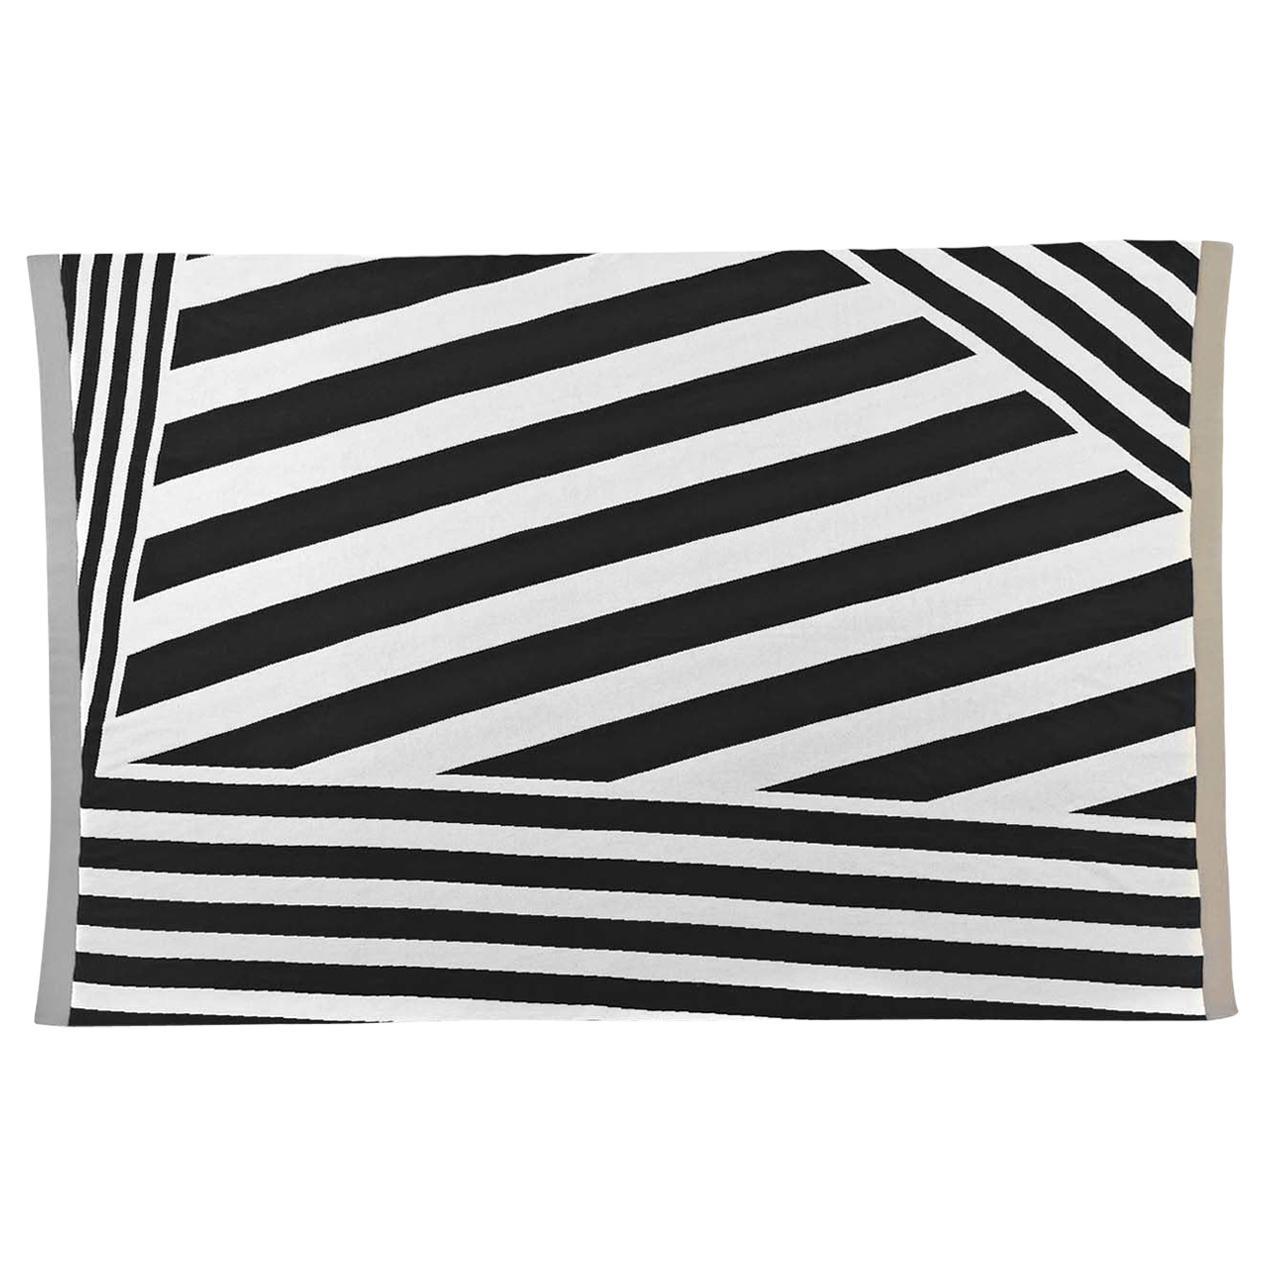 Diagonal Bands Blanket by Roberta Licini